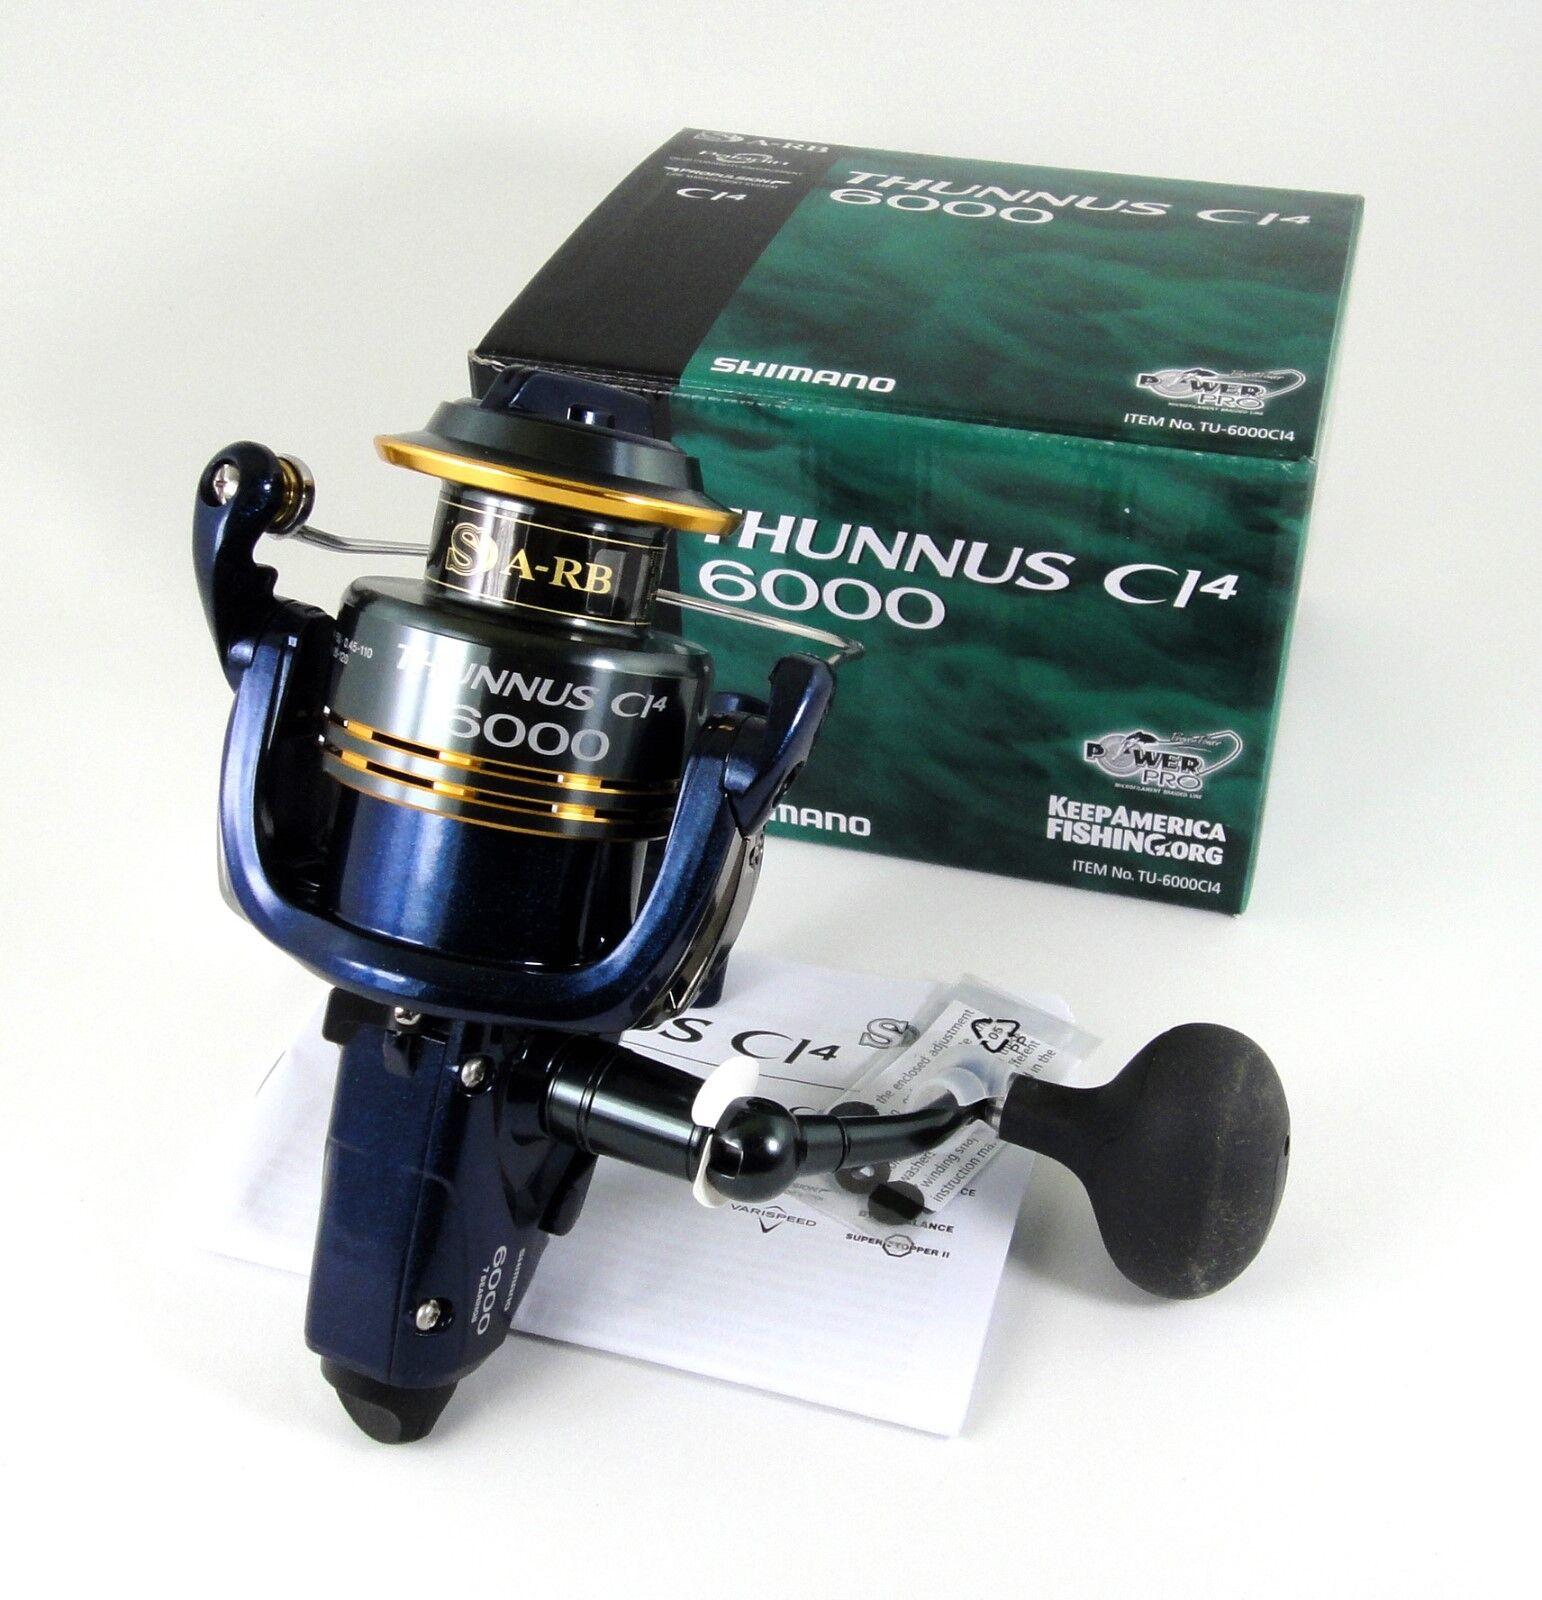 NEW SHIMANO THUNNUS CI4 6000 TU-6000CI4 USPS PM 1-3 DAY DELIVERY